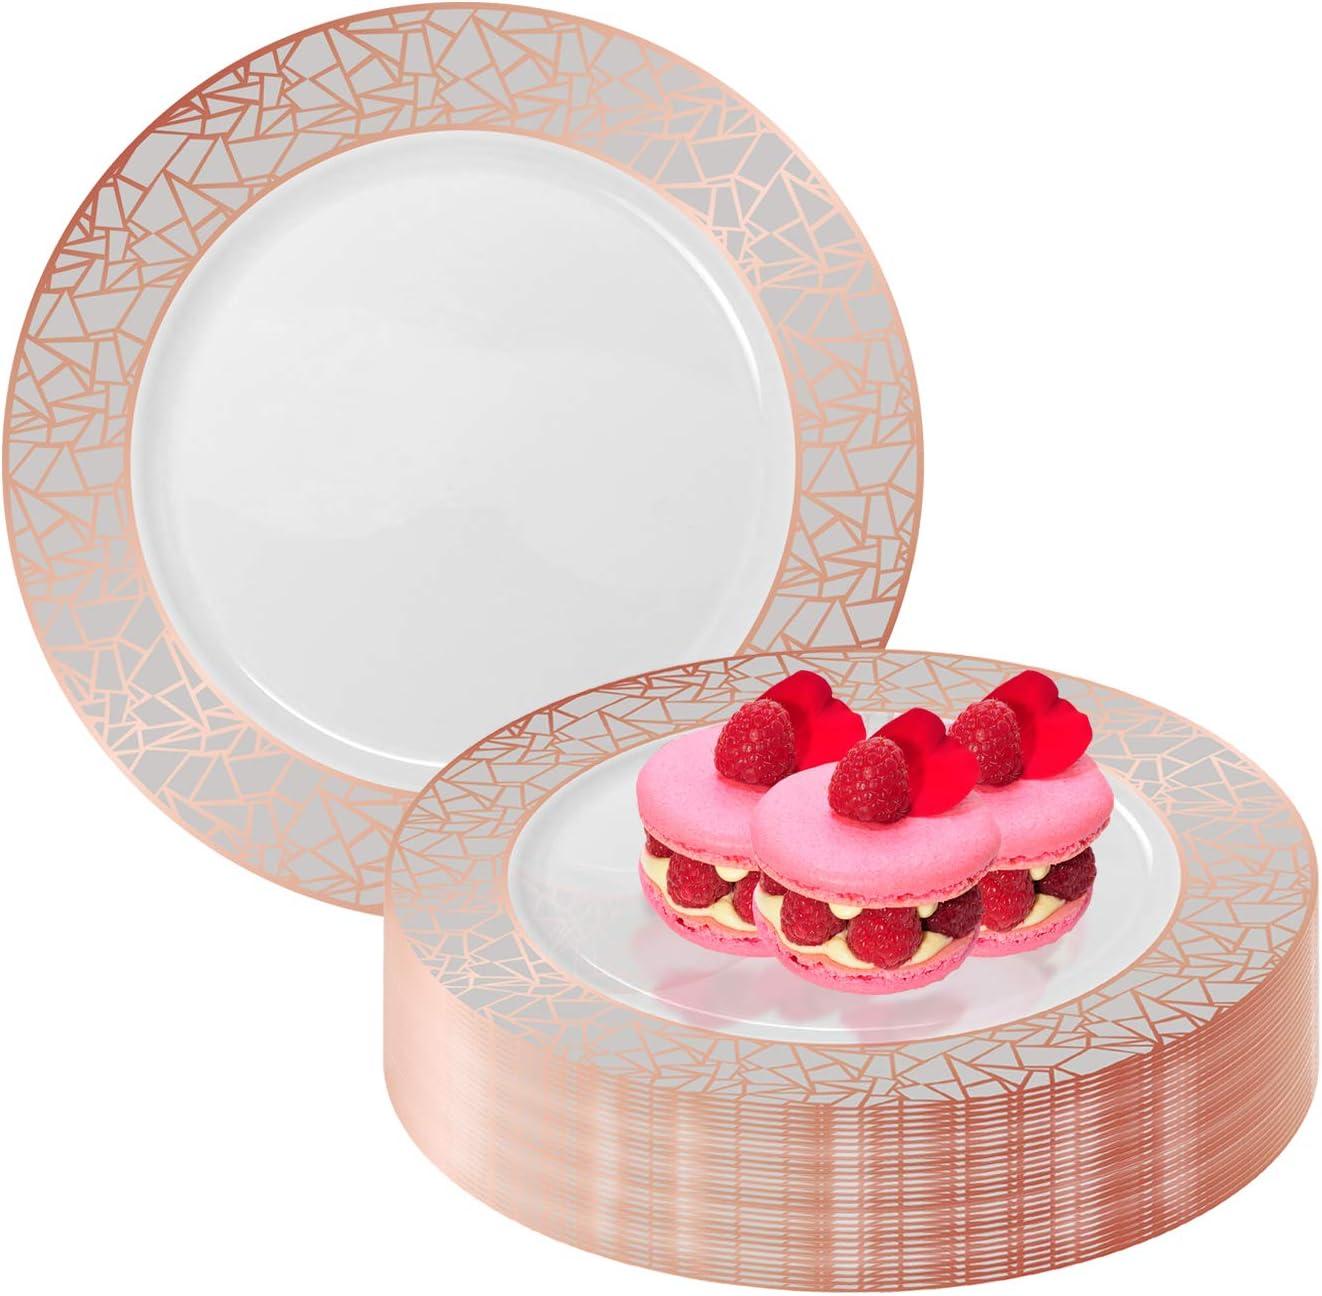 Elegant Disposable Plastic Dessert Plates Tulsa Mall OFFicial mail order 120 - D Pcs Heavy 7.5